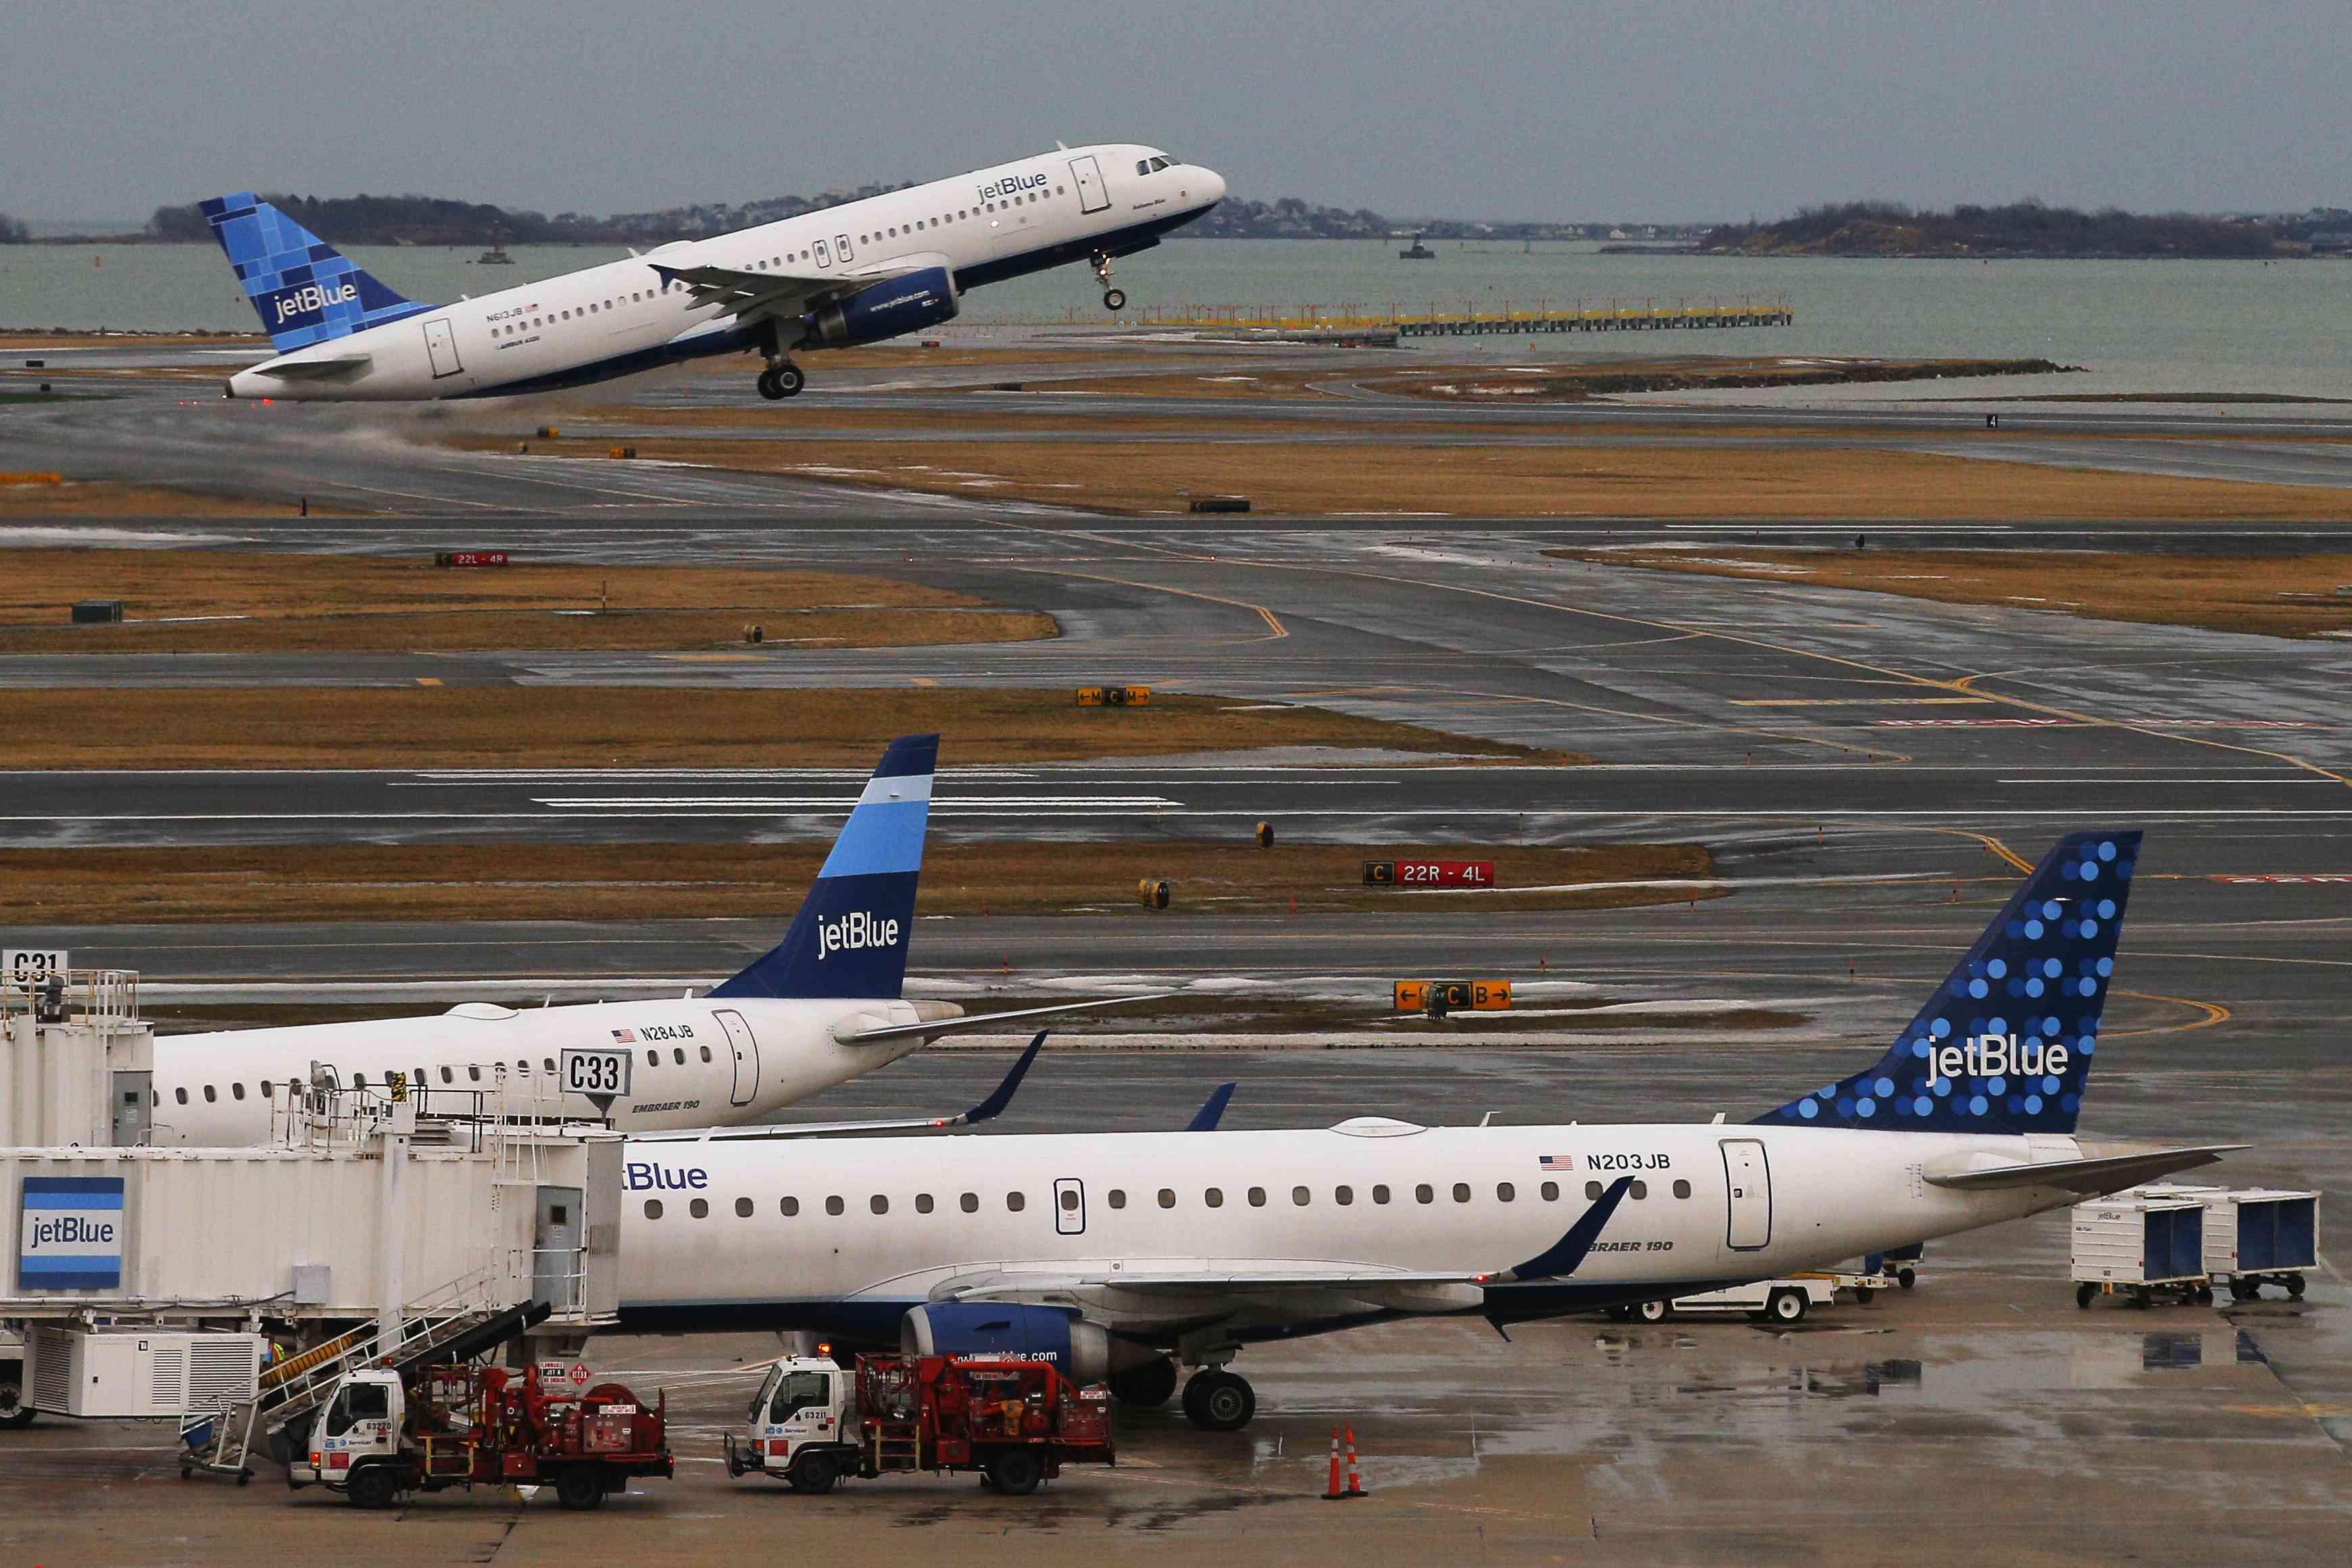 A jetBlue plane takes off